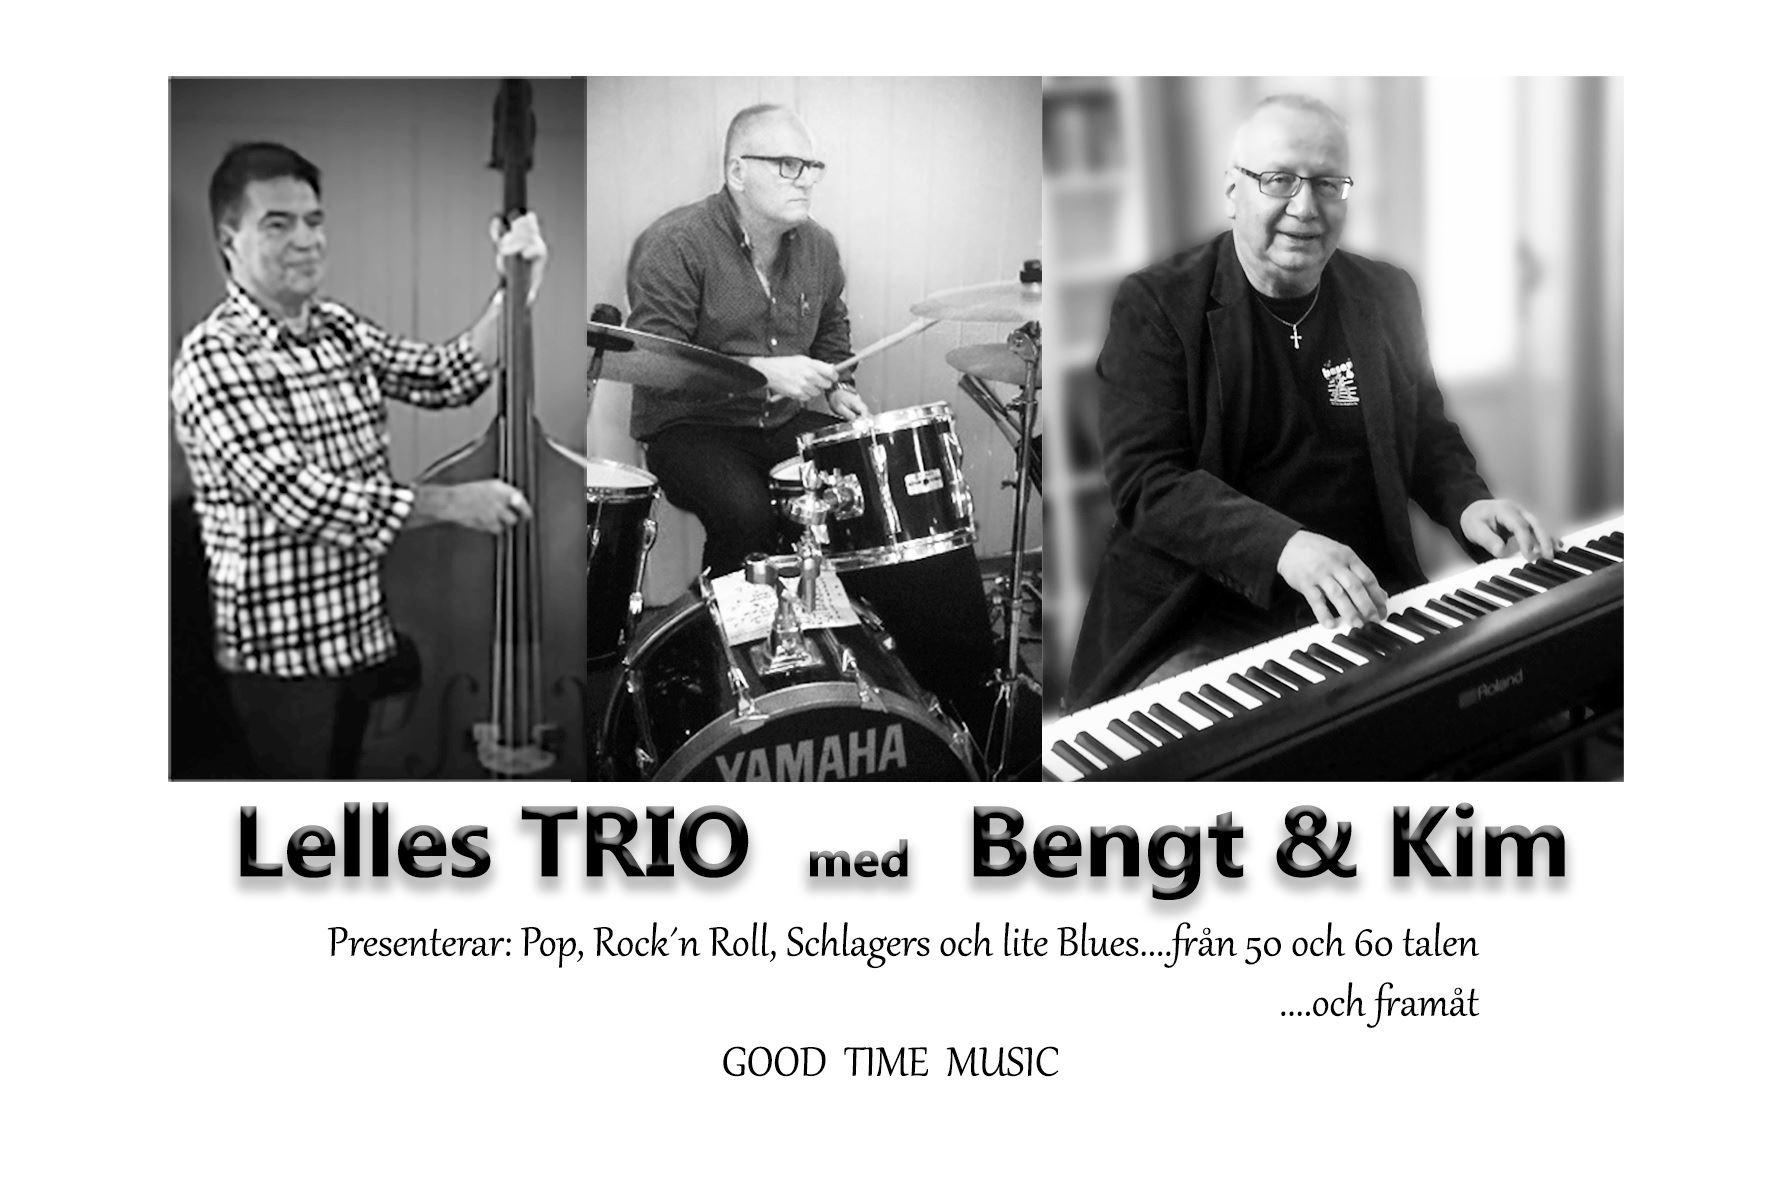 Lelles Trio med Bengt & Kim